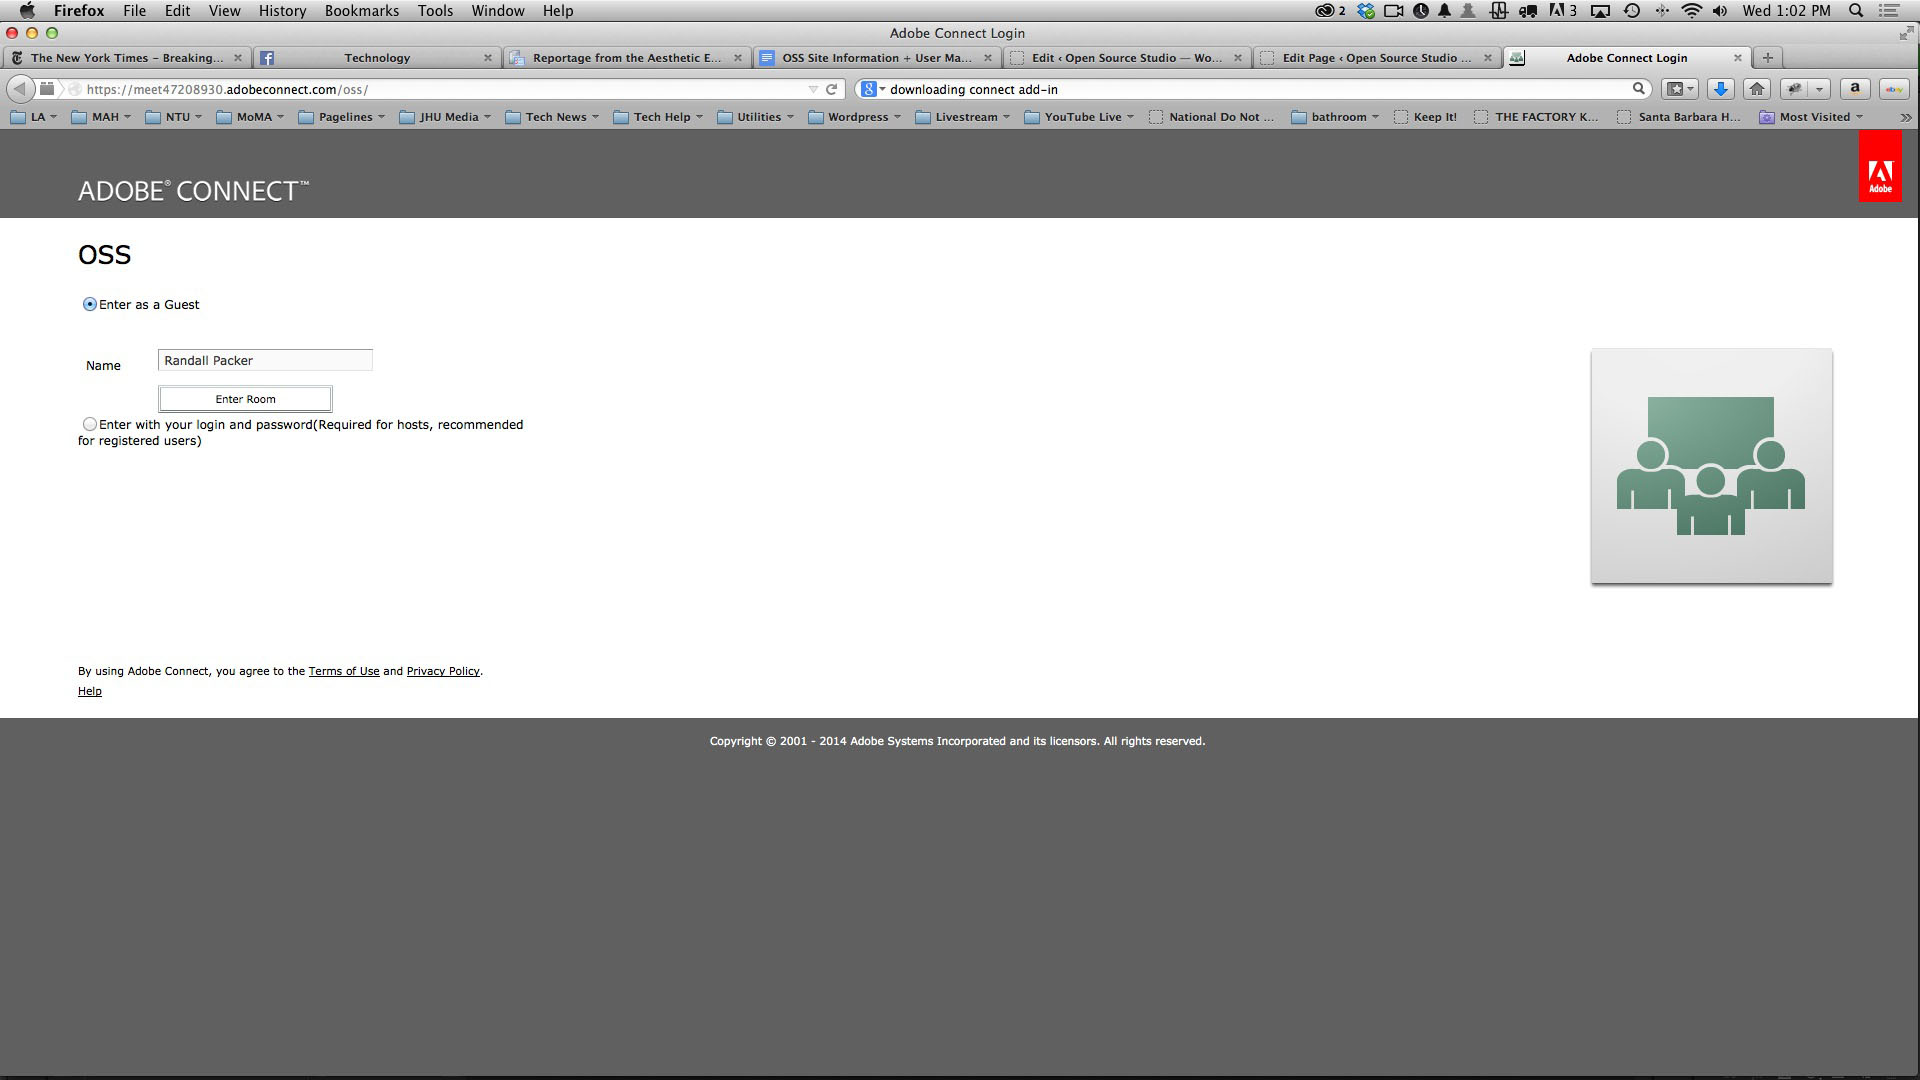 Adobe connect 9 background image size - Guestlogin_screenshot 2014 04 30 13 02 36